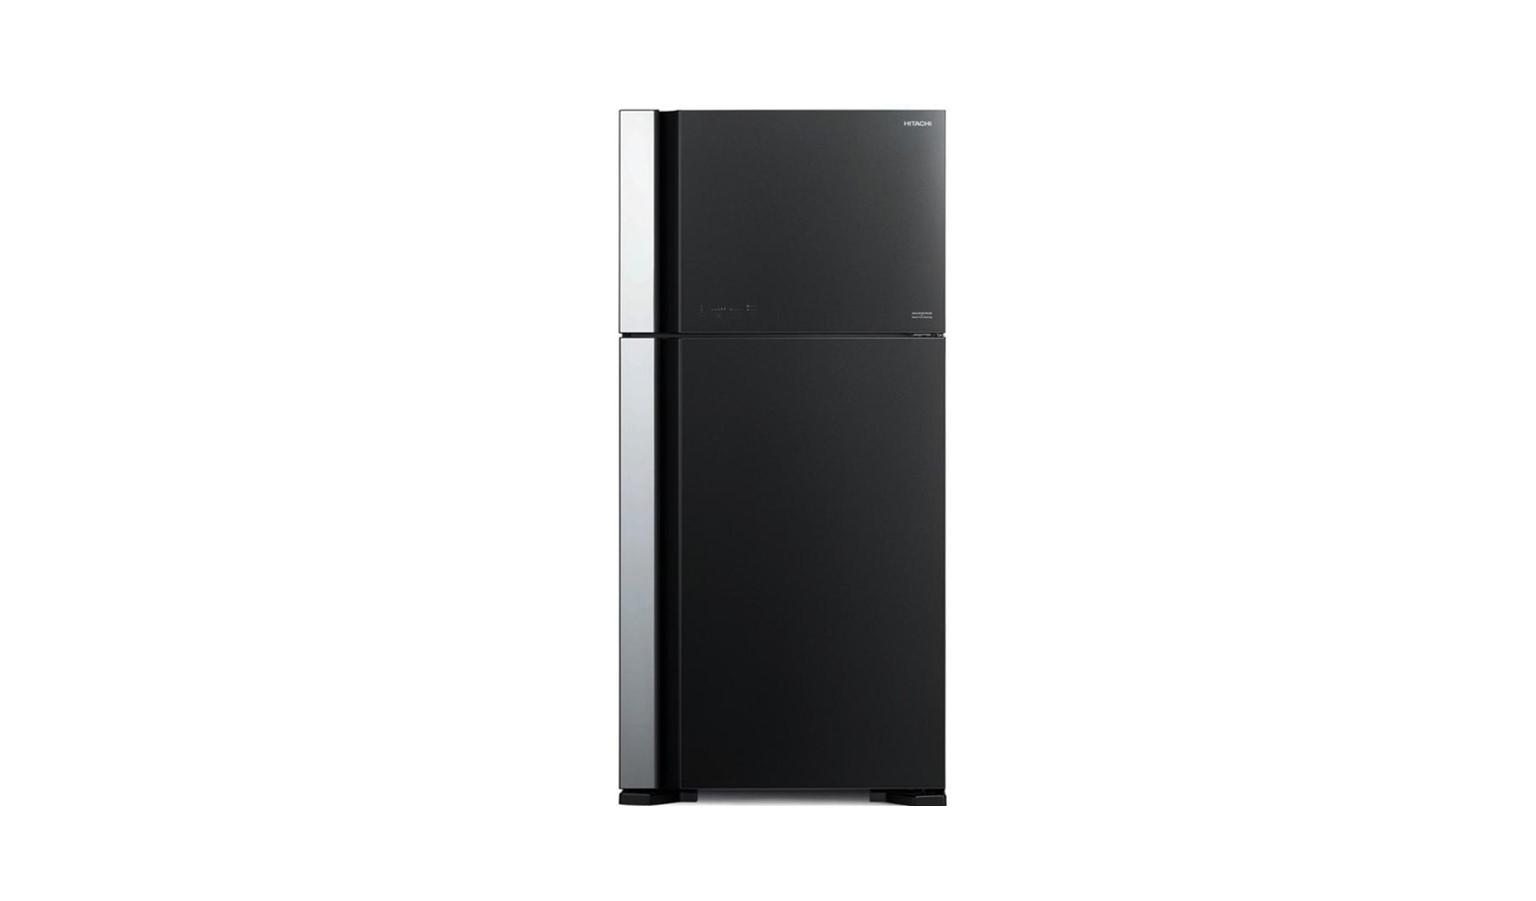 Hitachi R-VG710P7M-1 GGR 601L 2 Door Fridge - Glass Gray